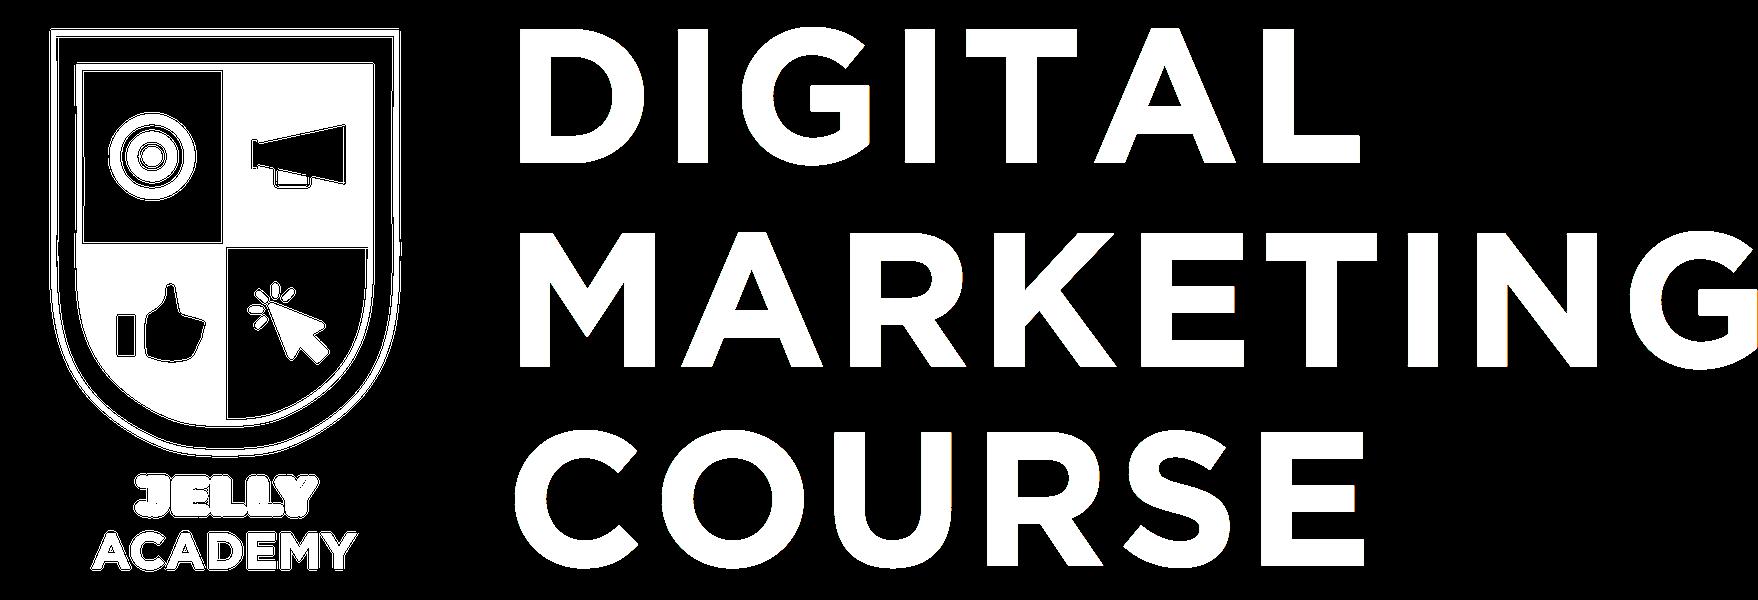 Jelly Academy Digital Marketing Course